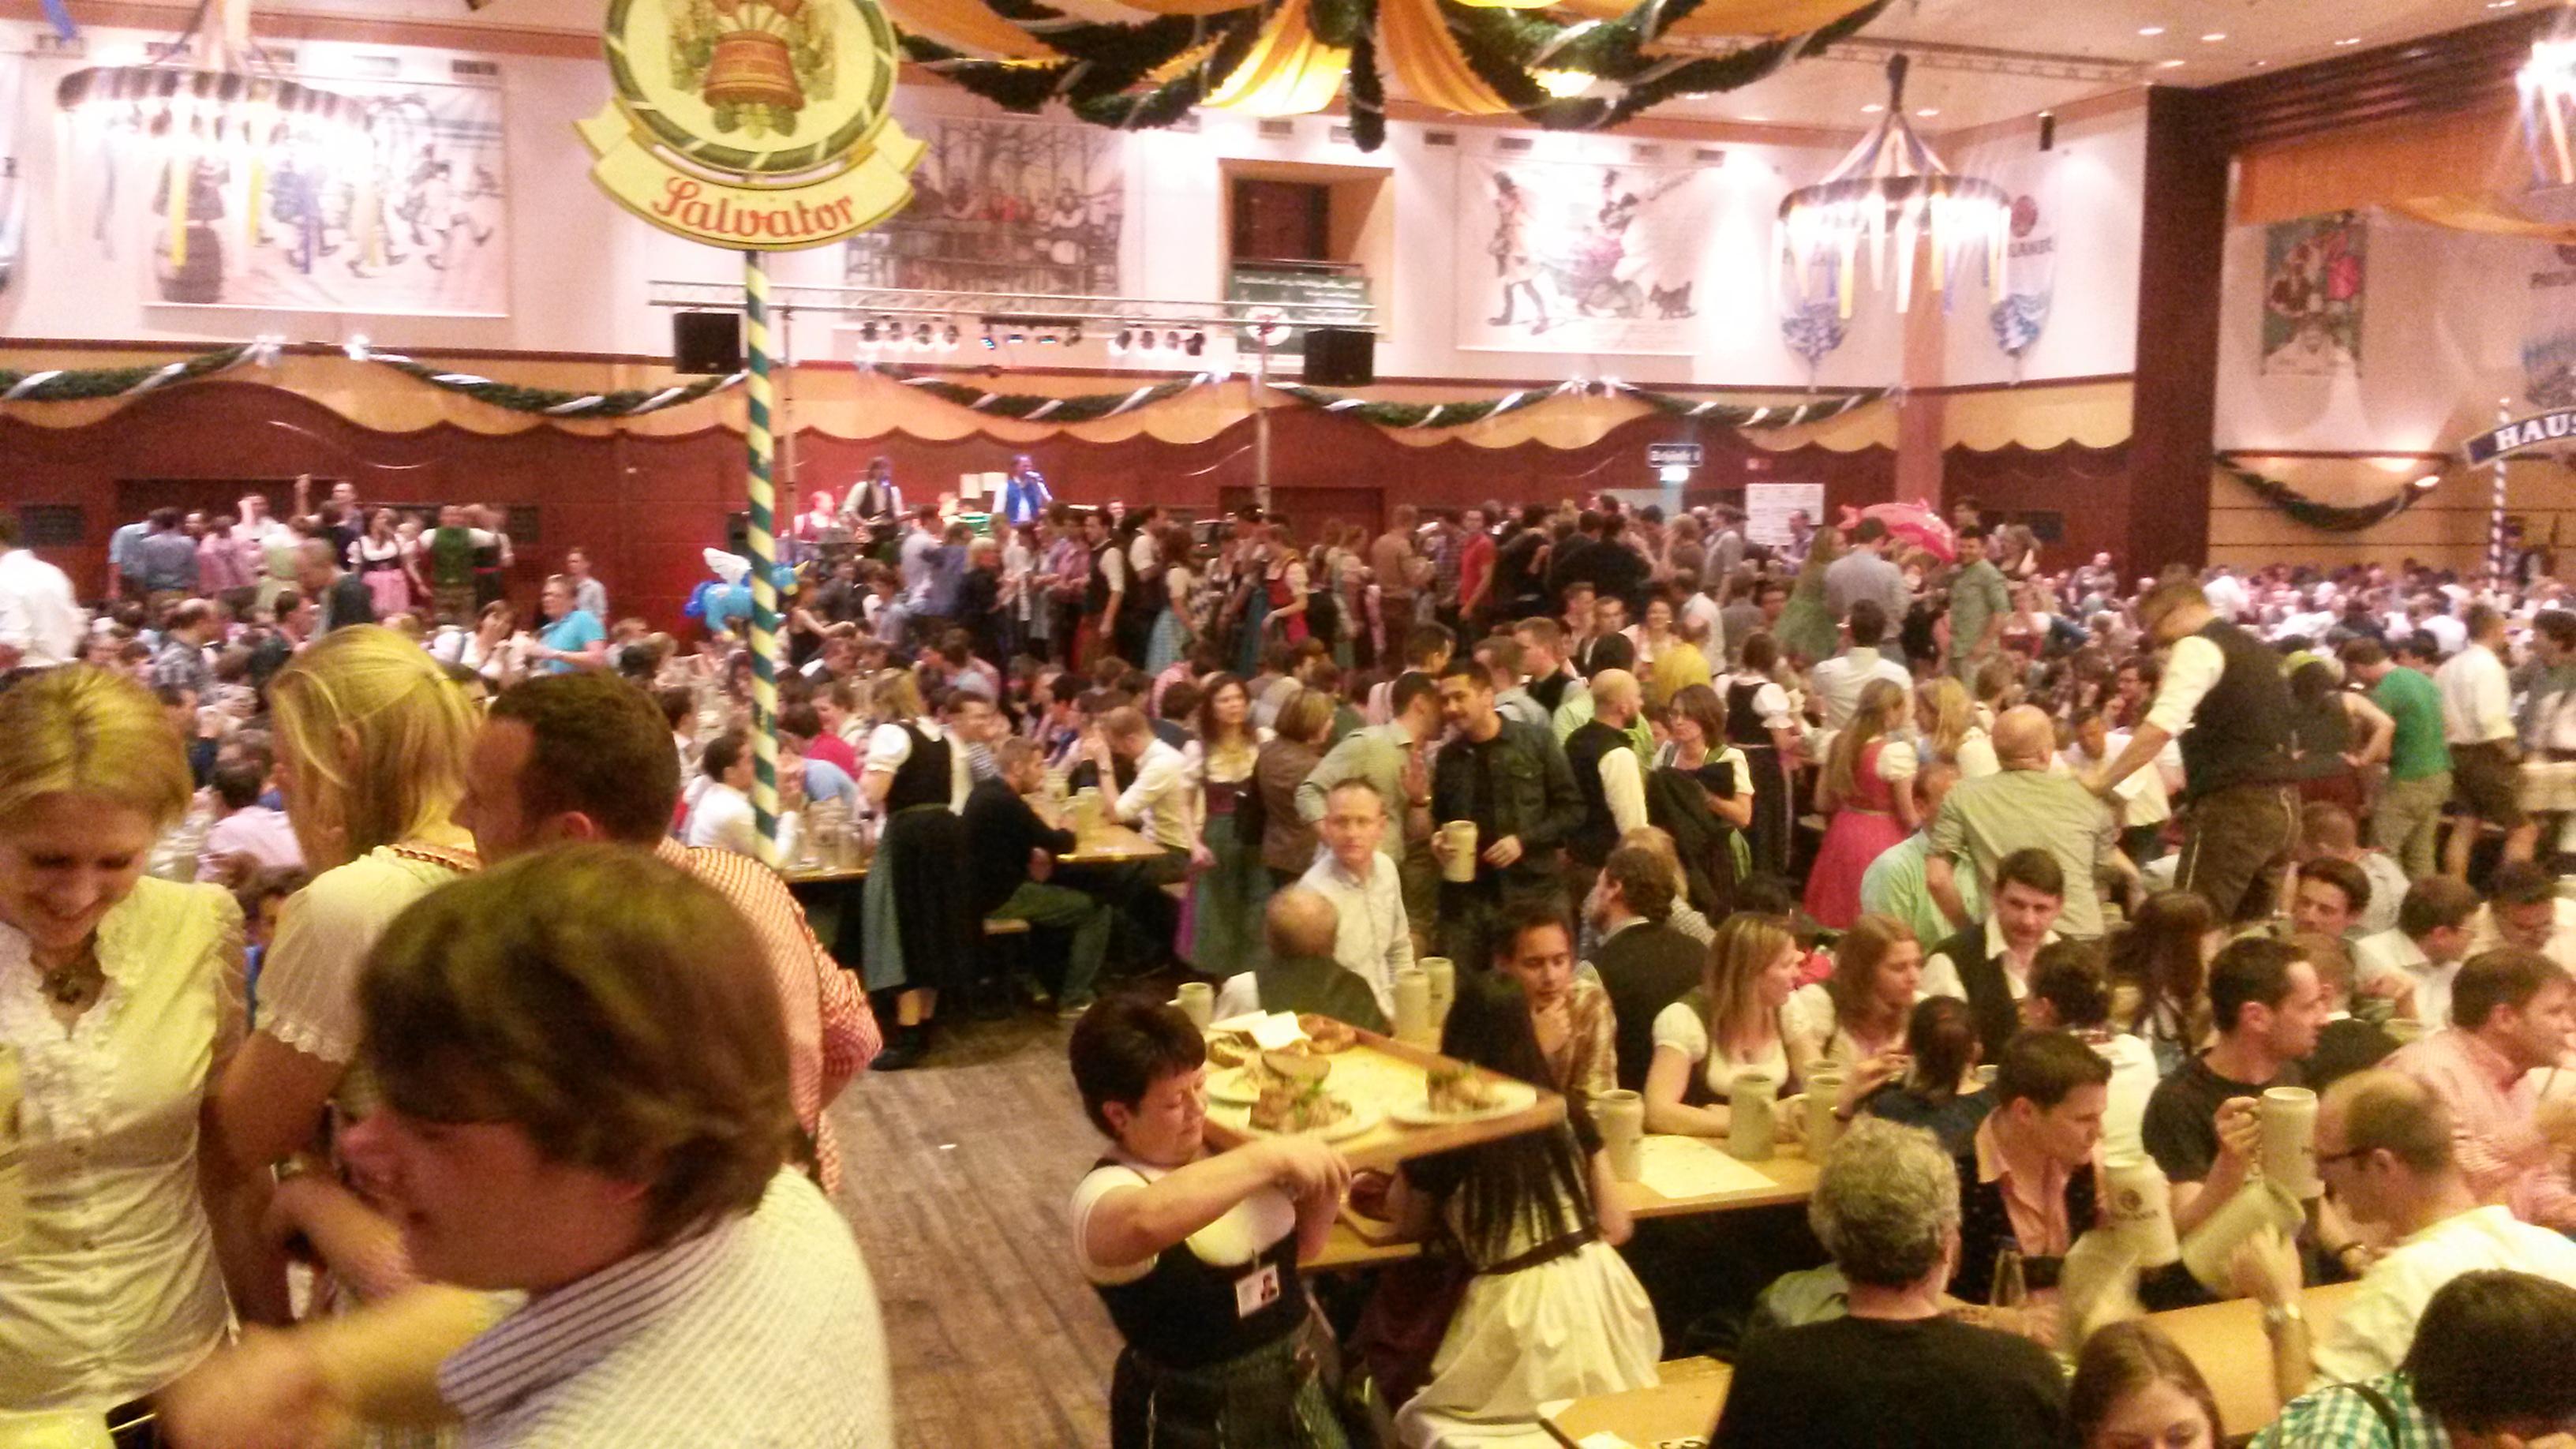 Starkbierfest Nockherberg 2021